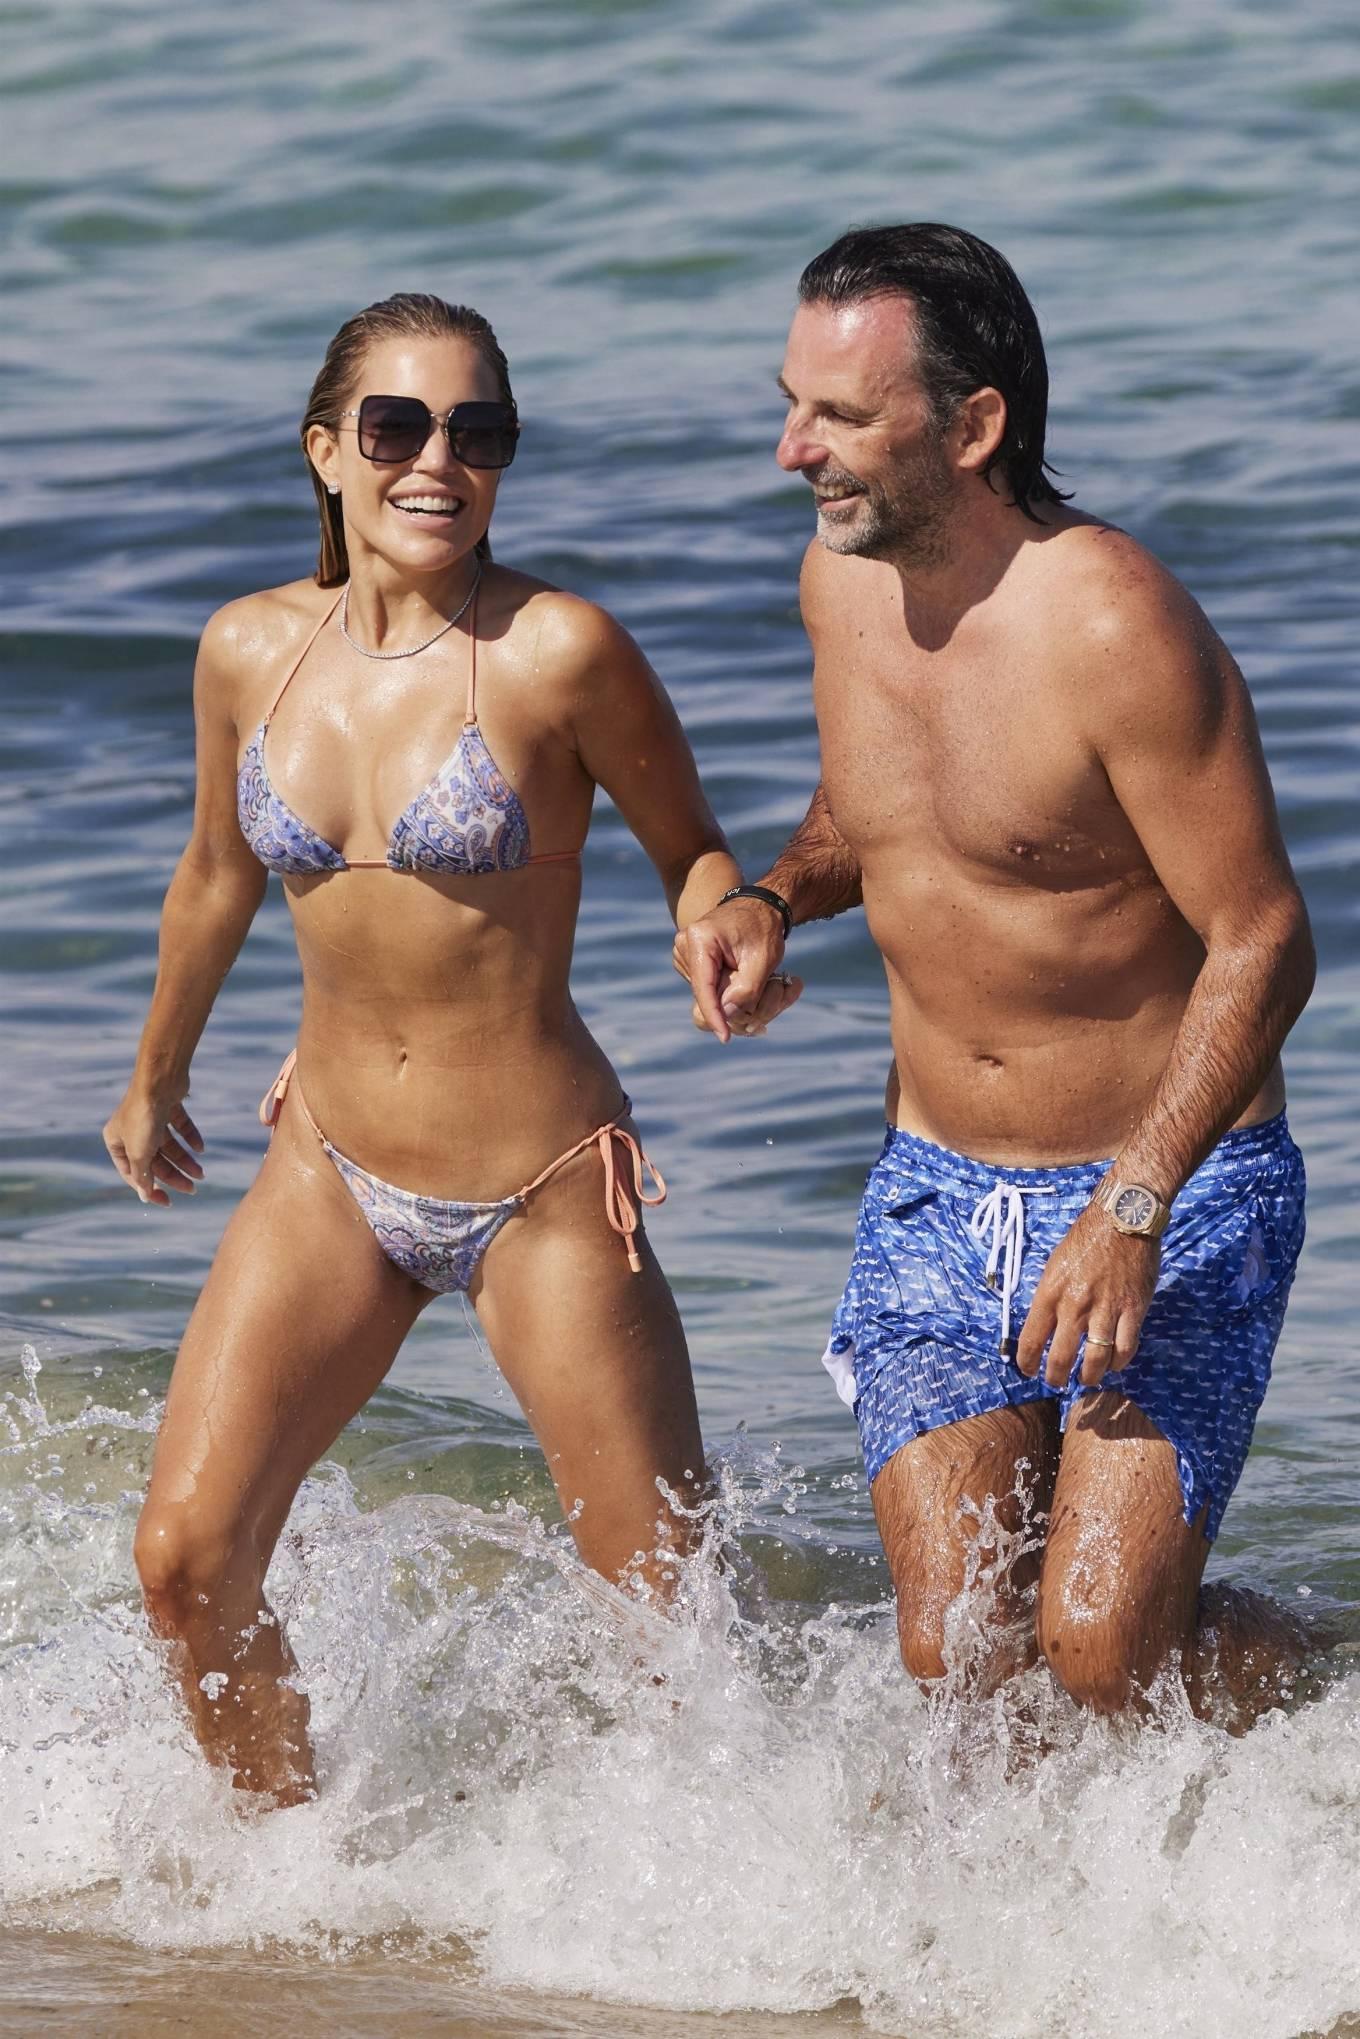 Sylvie Meis 2021 : Sylvie Meis – In a bikini with her husband Niclas Castello on the beach La Réserve in Ramatuelle-18